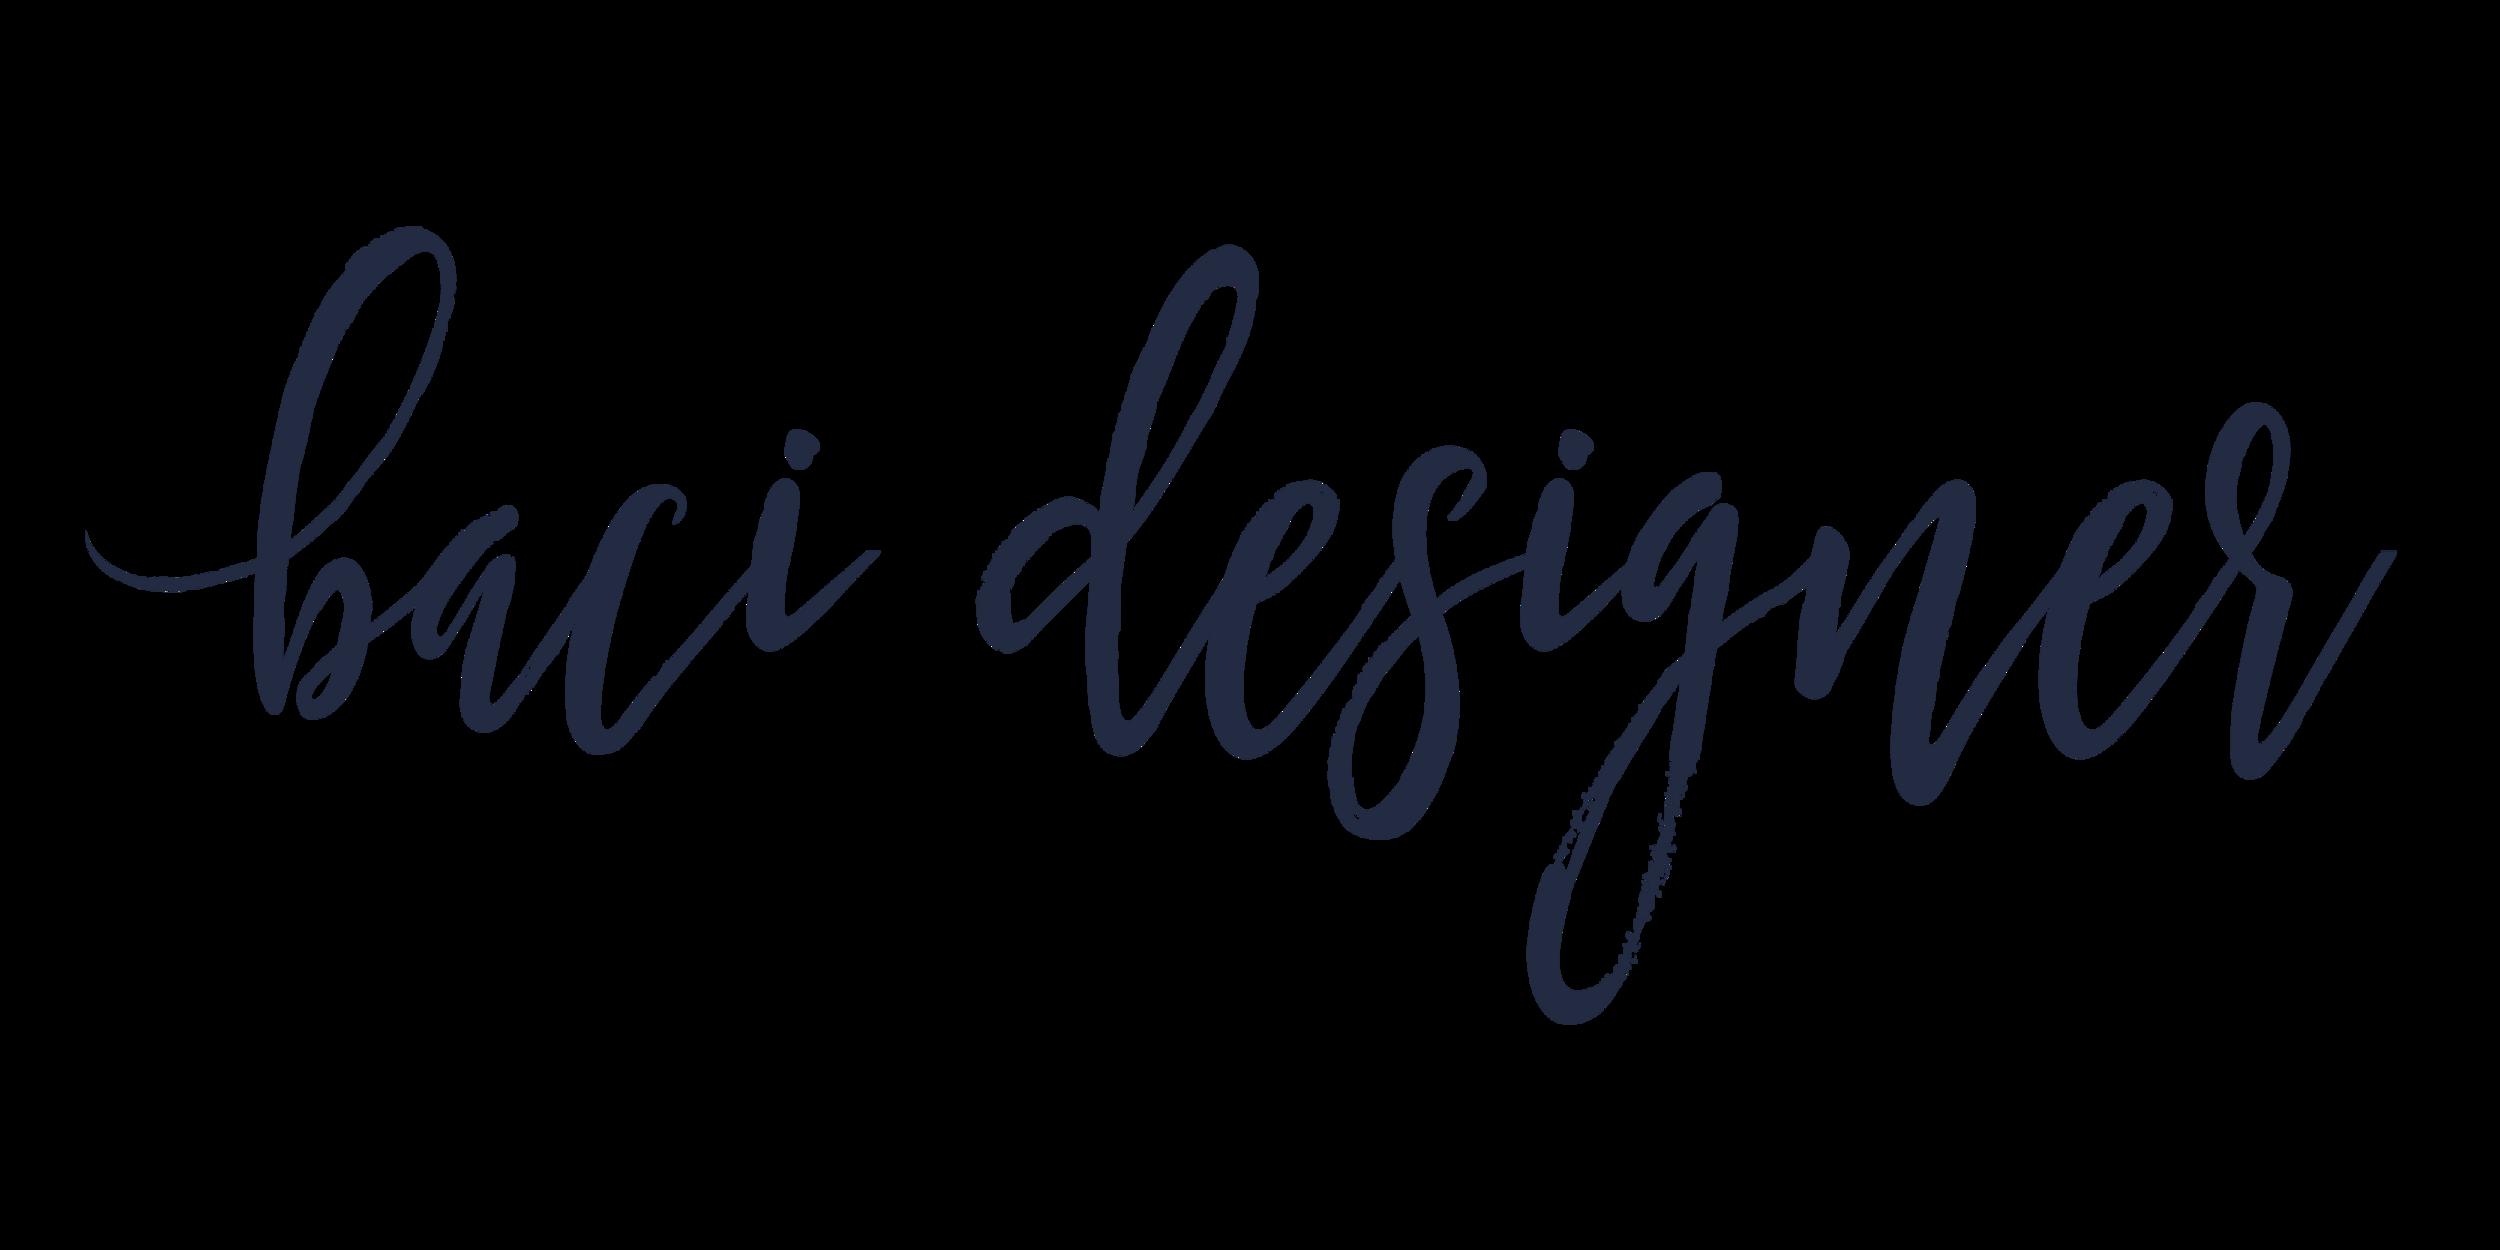 baci designer lol.png